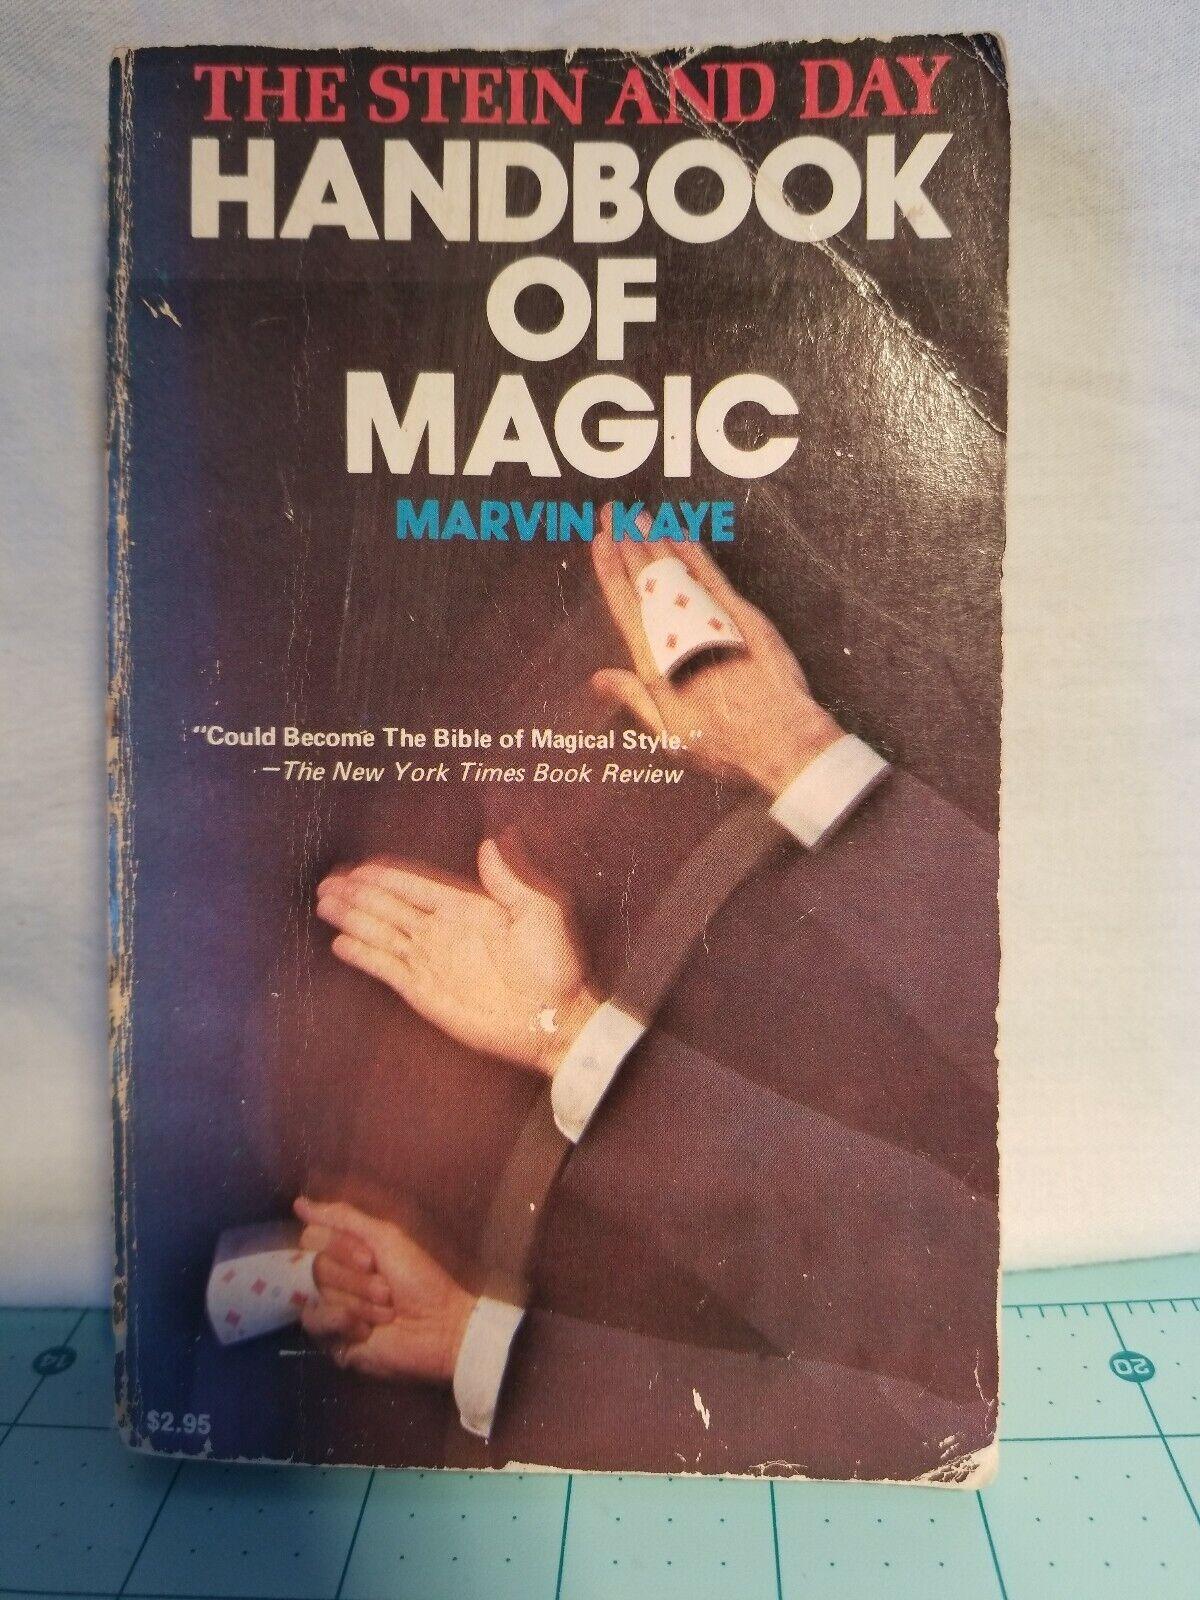 Book Banquet Magician/'s Handbook by David Charvet